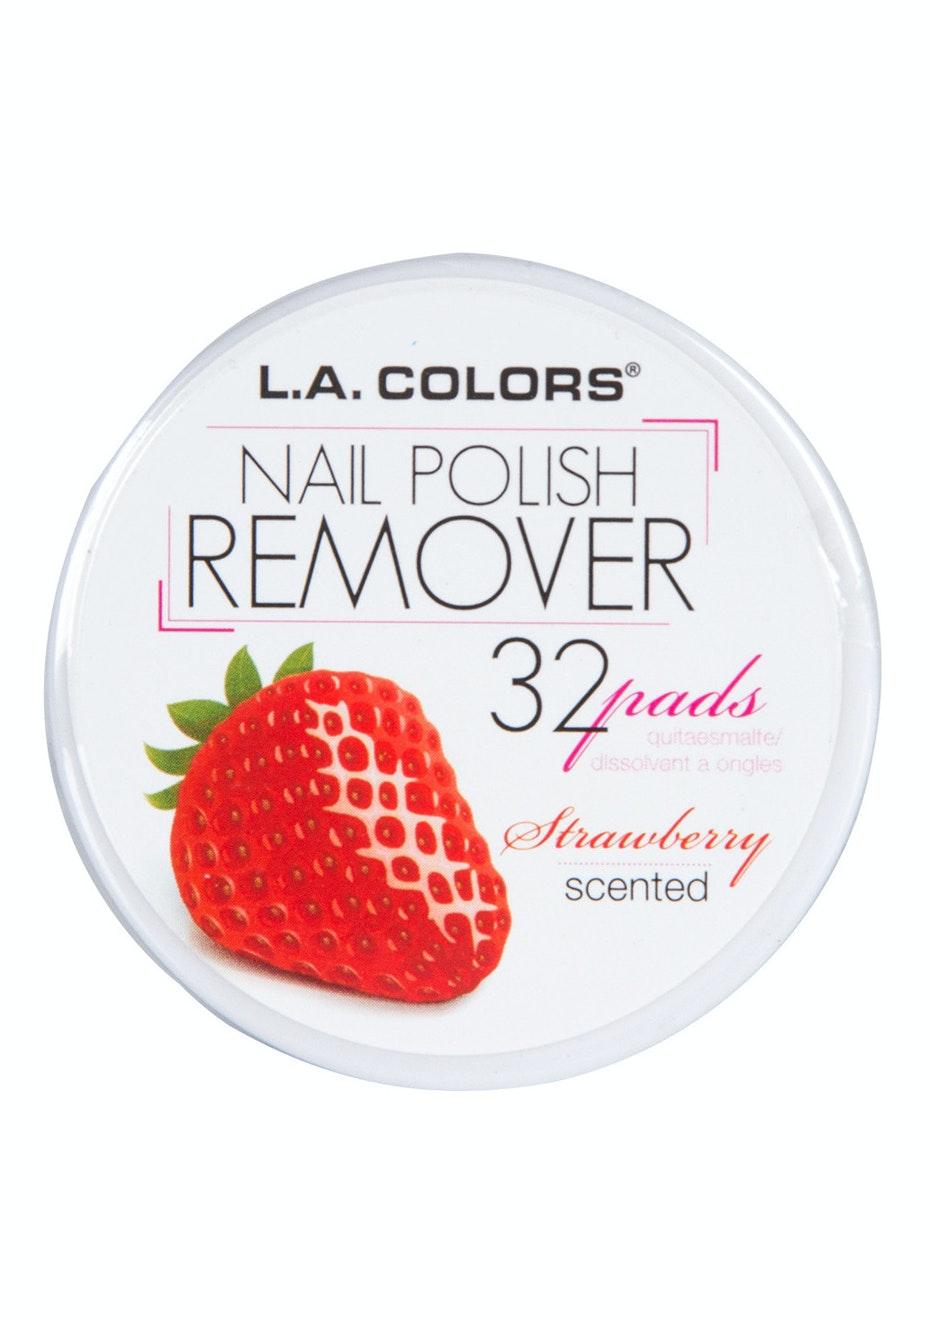 LA COLORS - Nail Polish Remover Pads  -  Strawberry